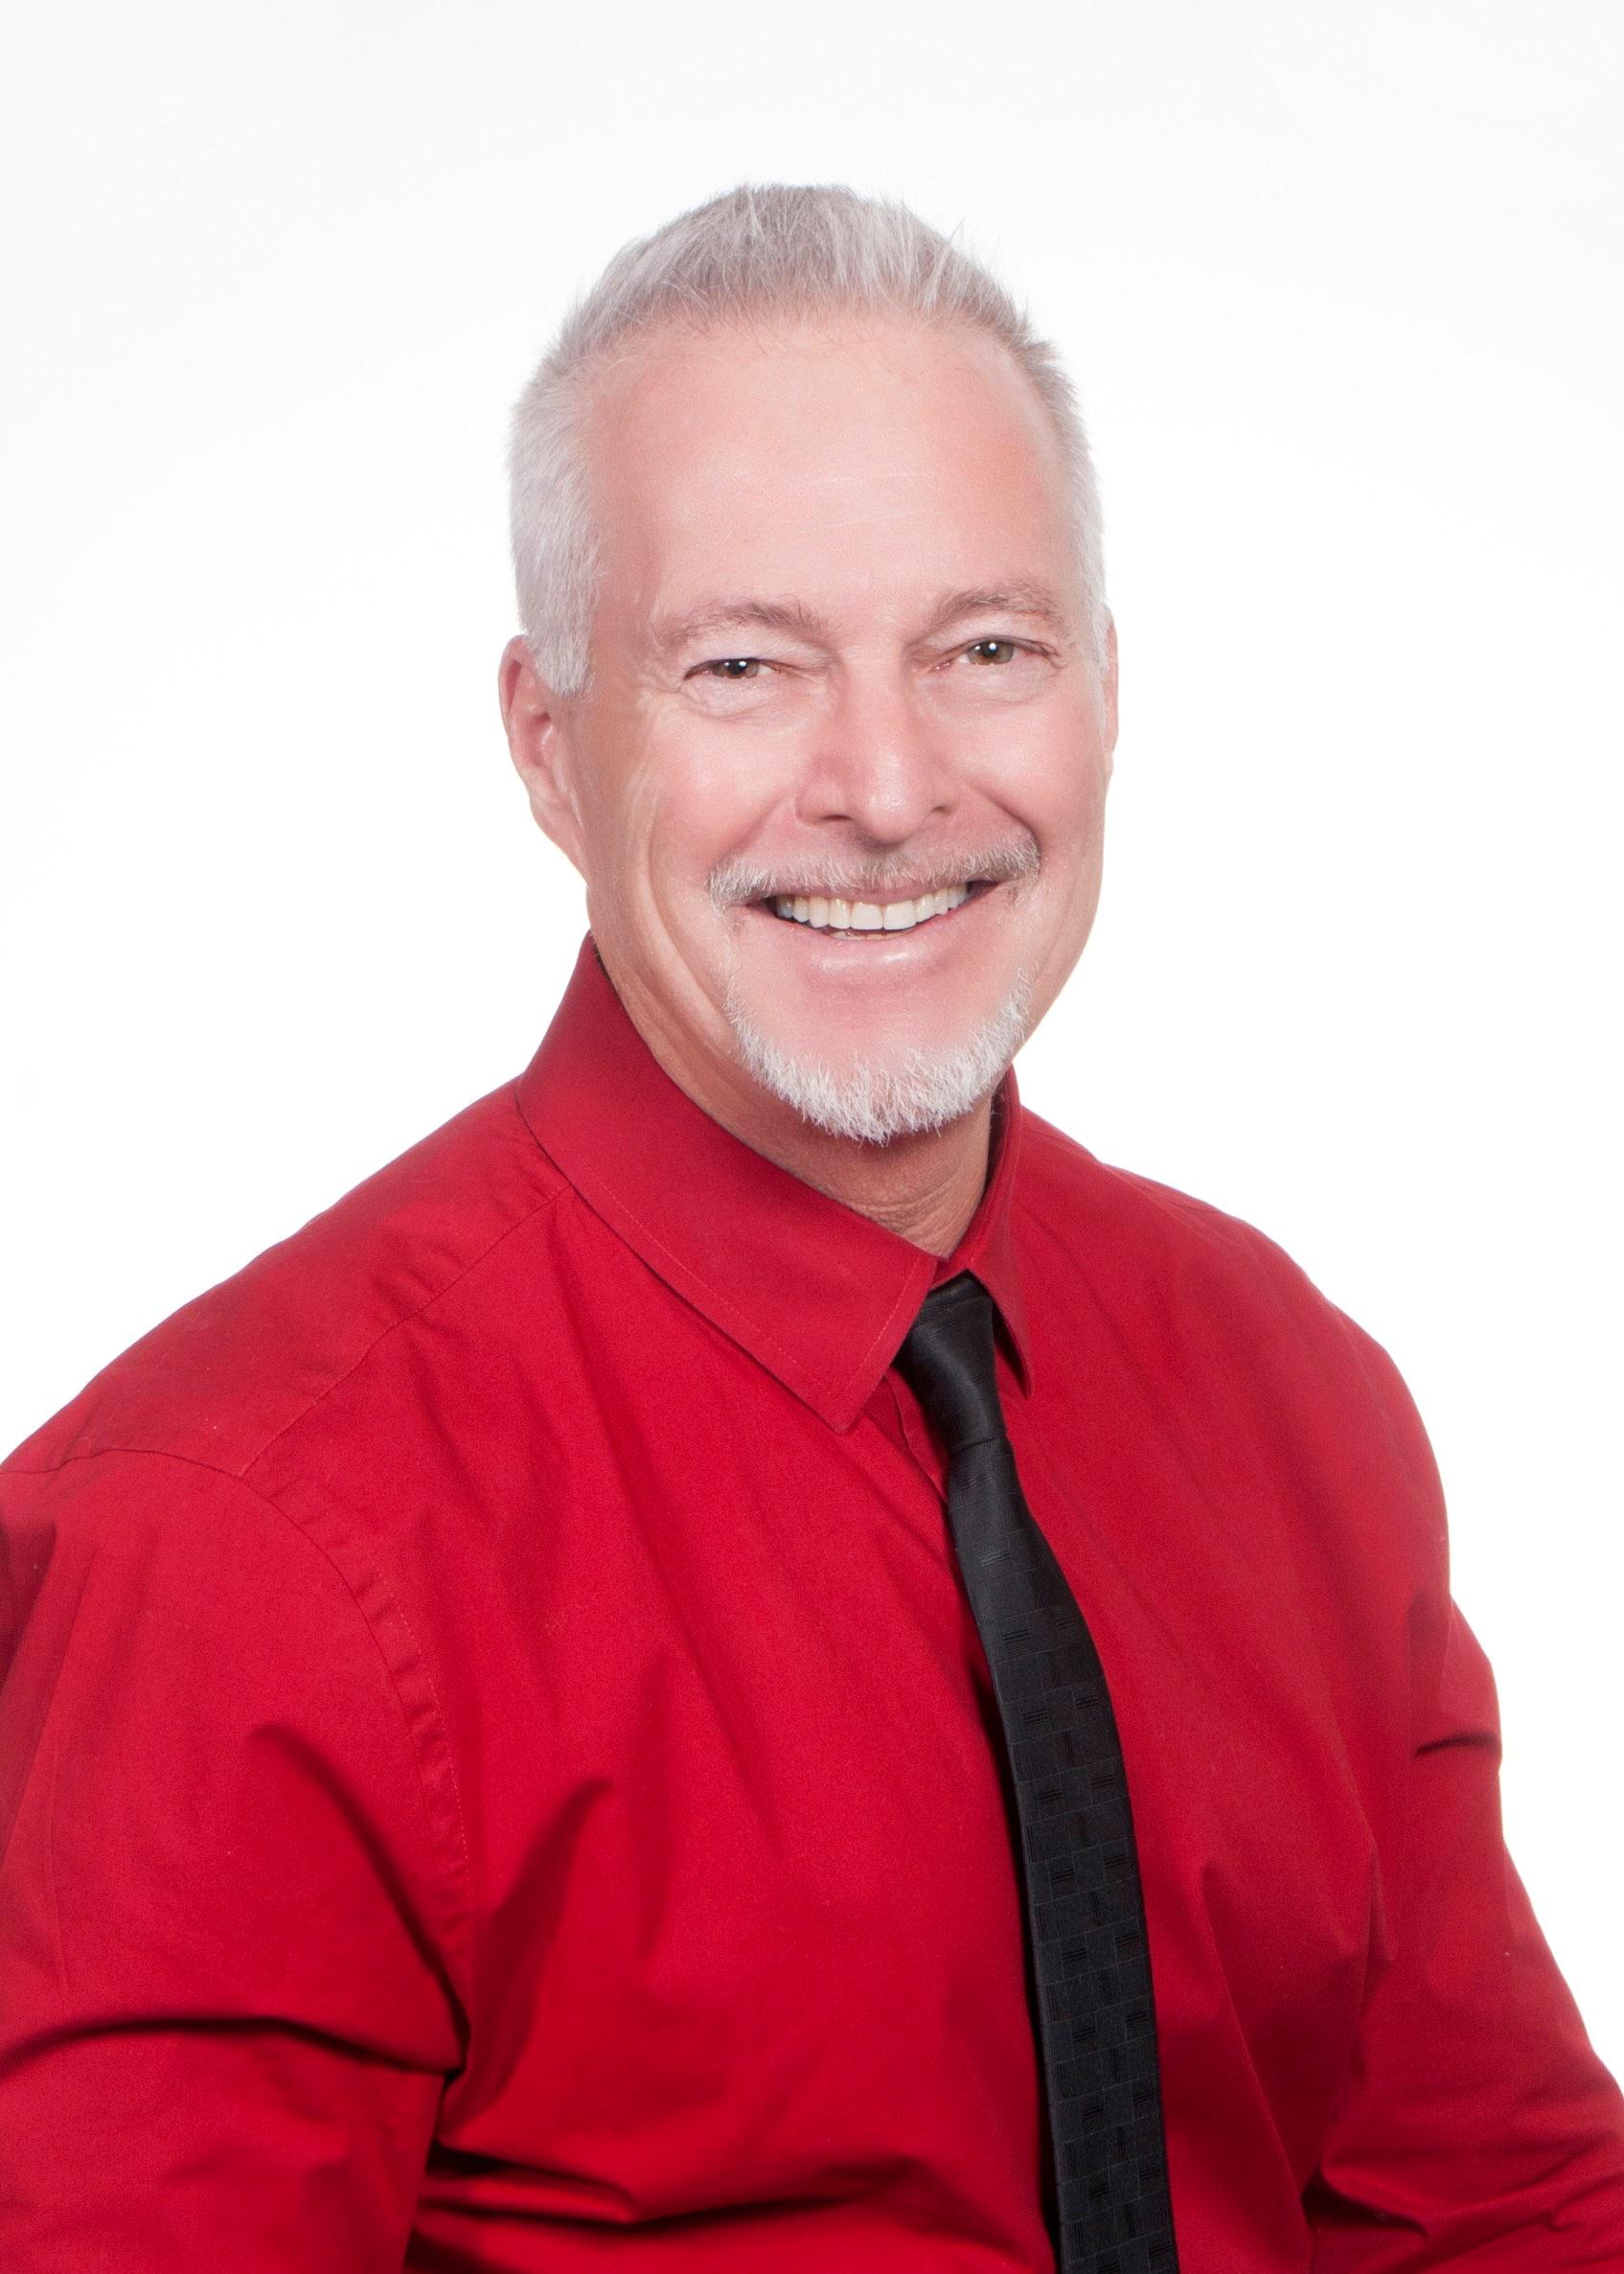 Jack Laurie, Riverside Medical Clinic - Pediatrics Doctor in